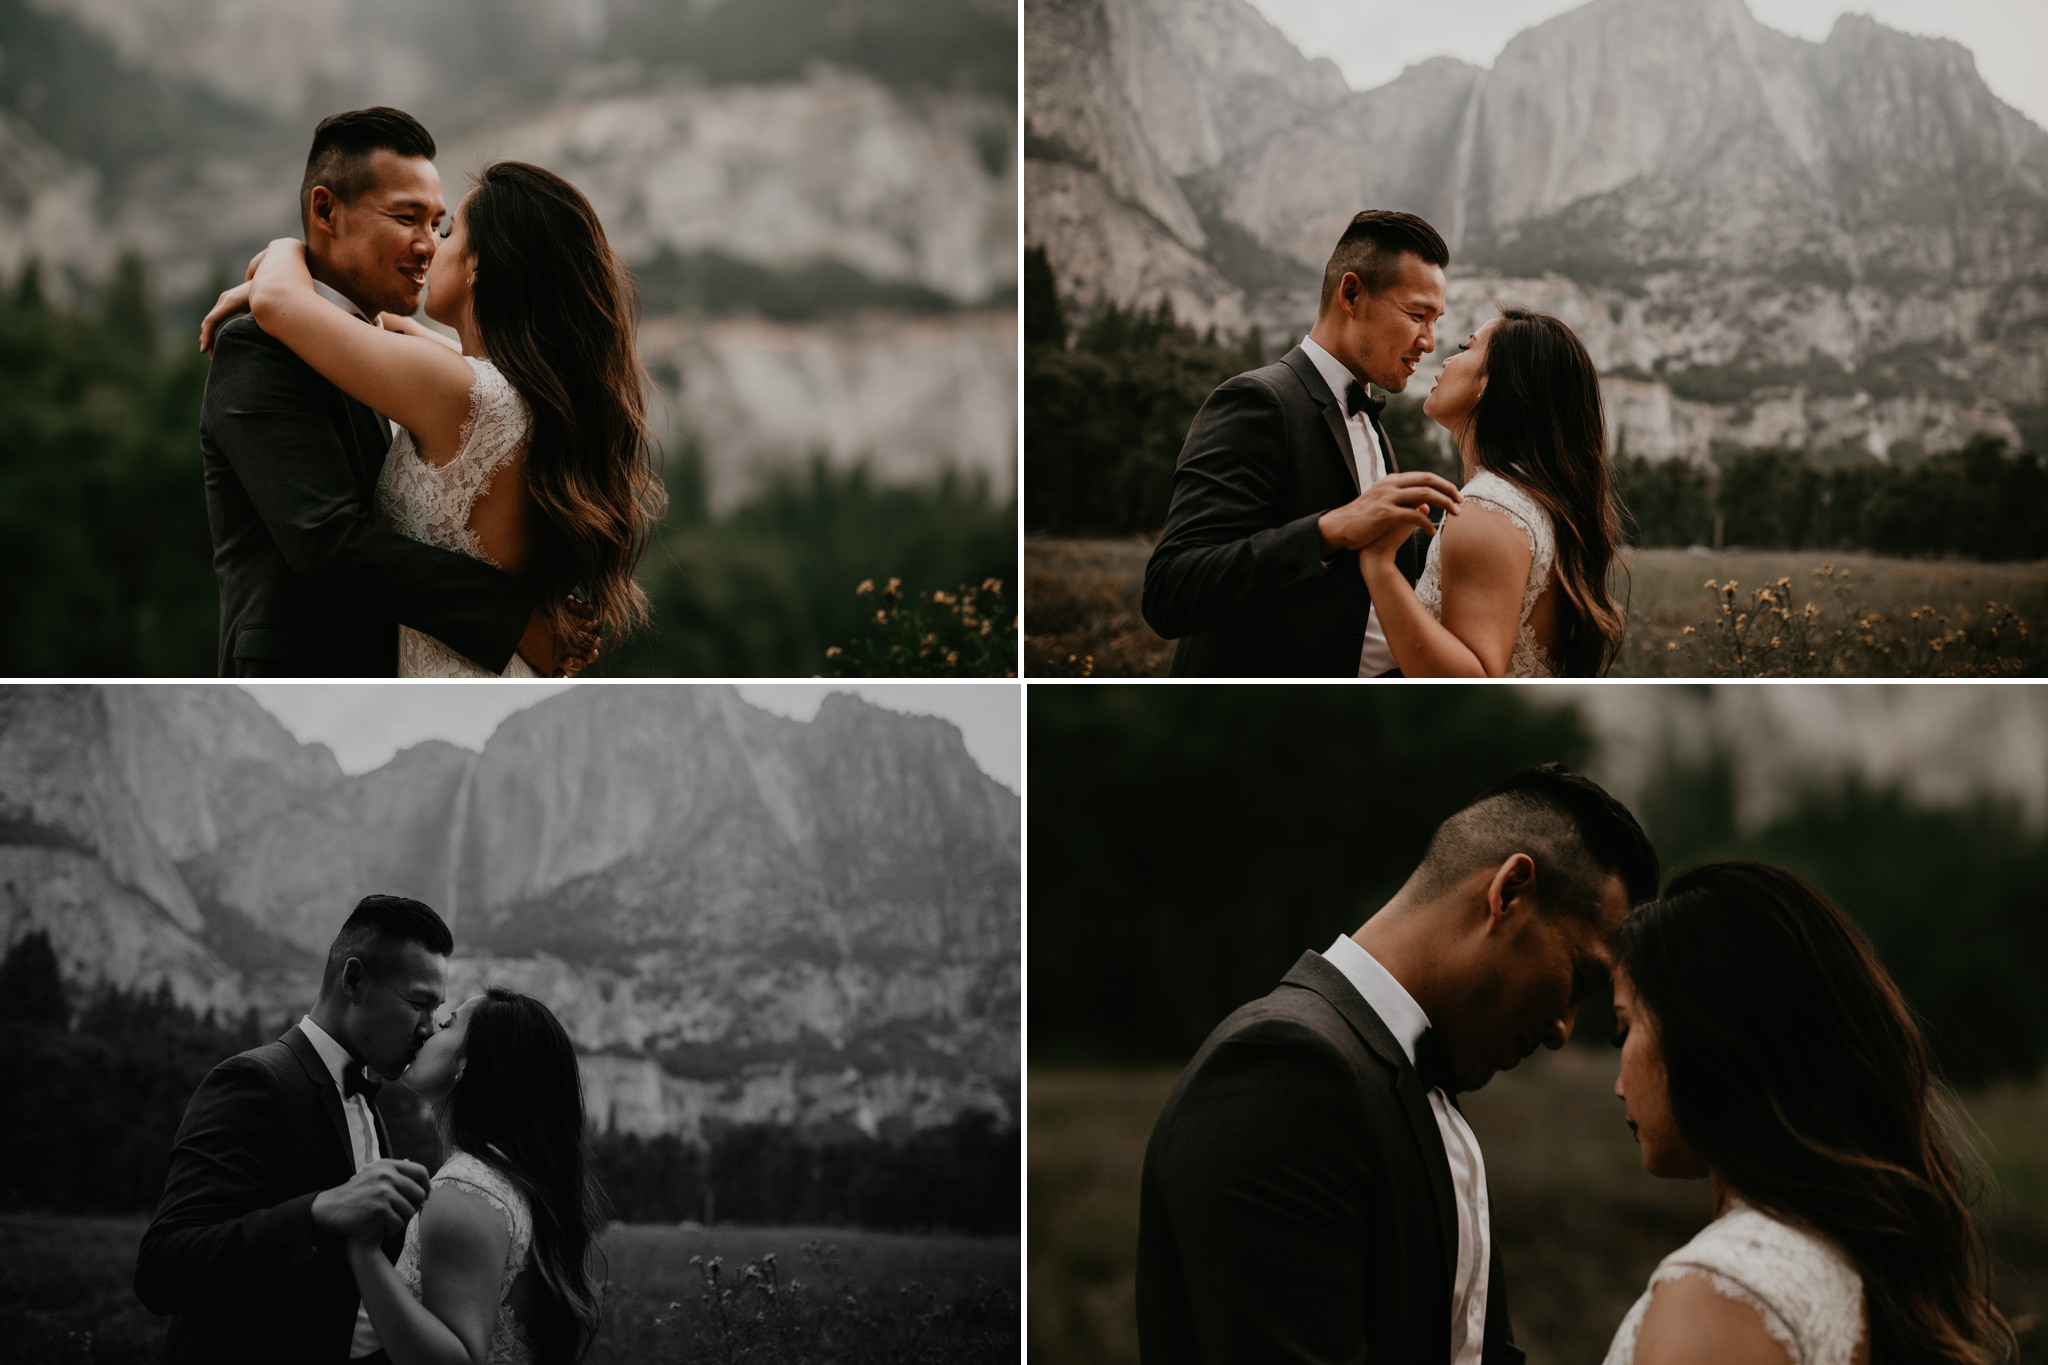 Yosemite-Valley-Wedding7.jpg